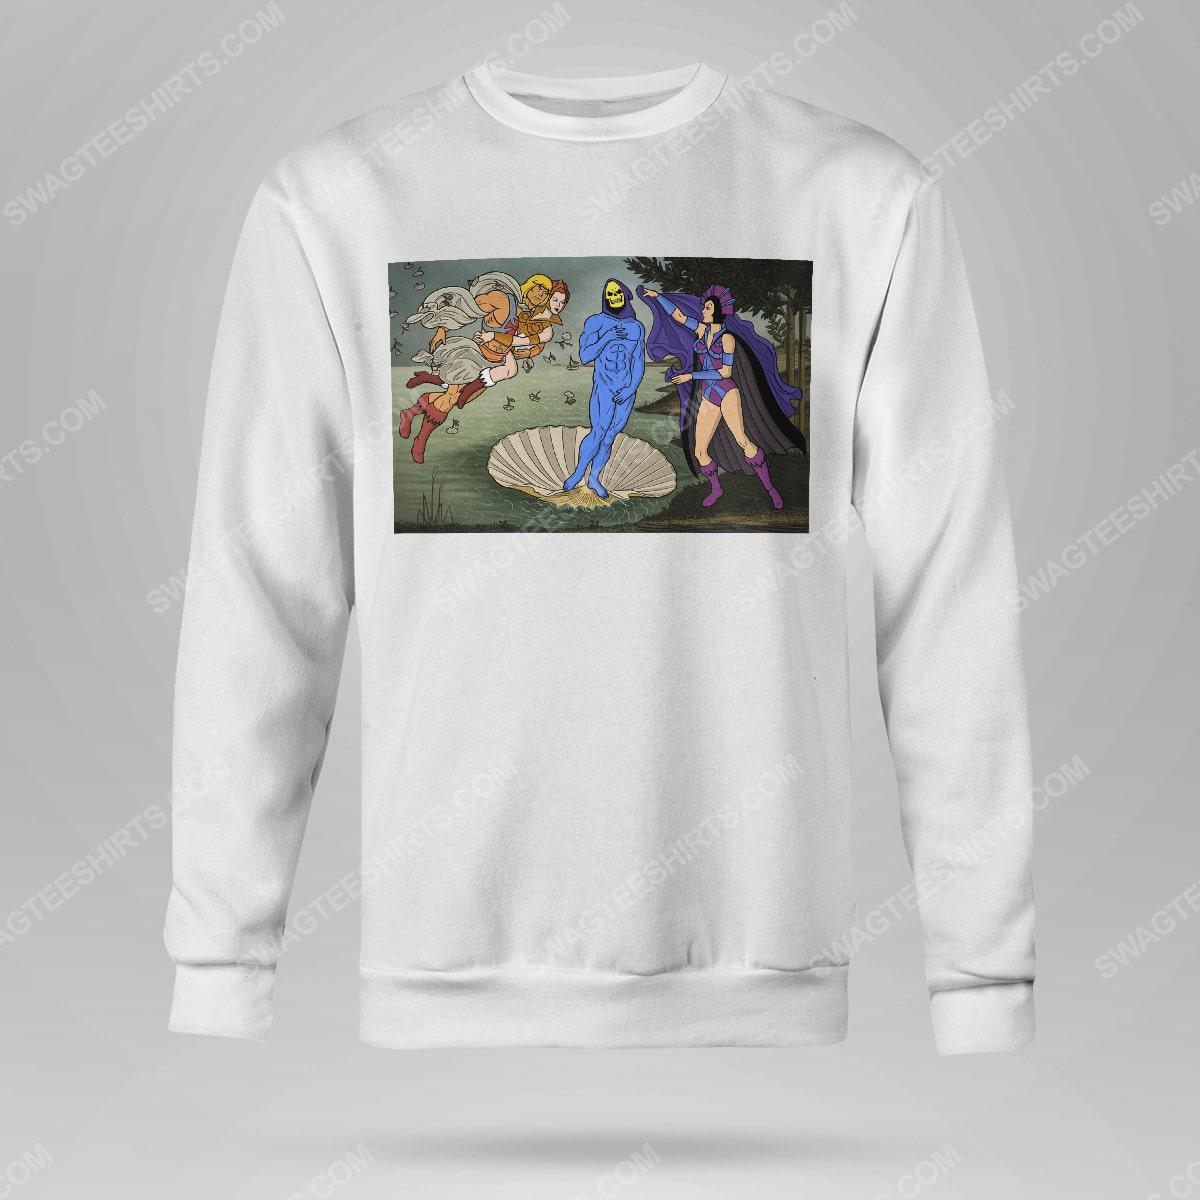 The birth of venus renaissance masters sweatshirt(1)